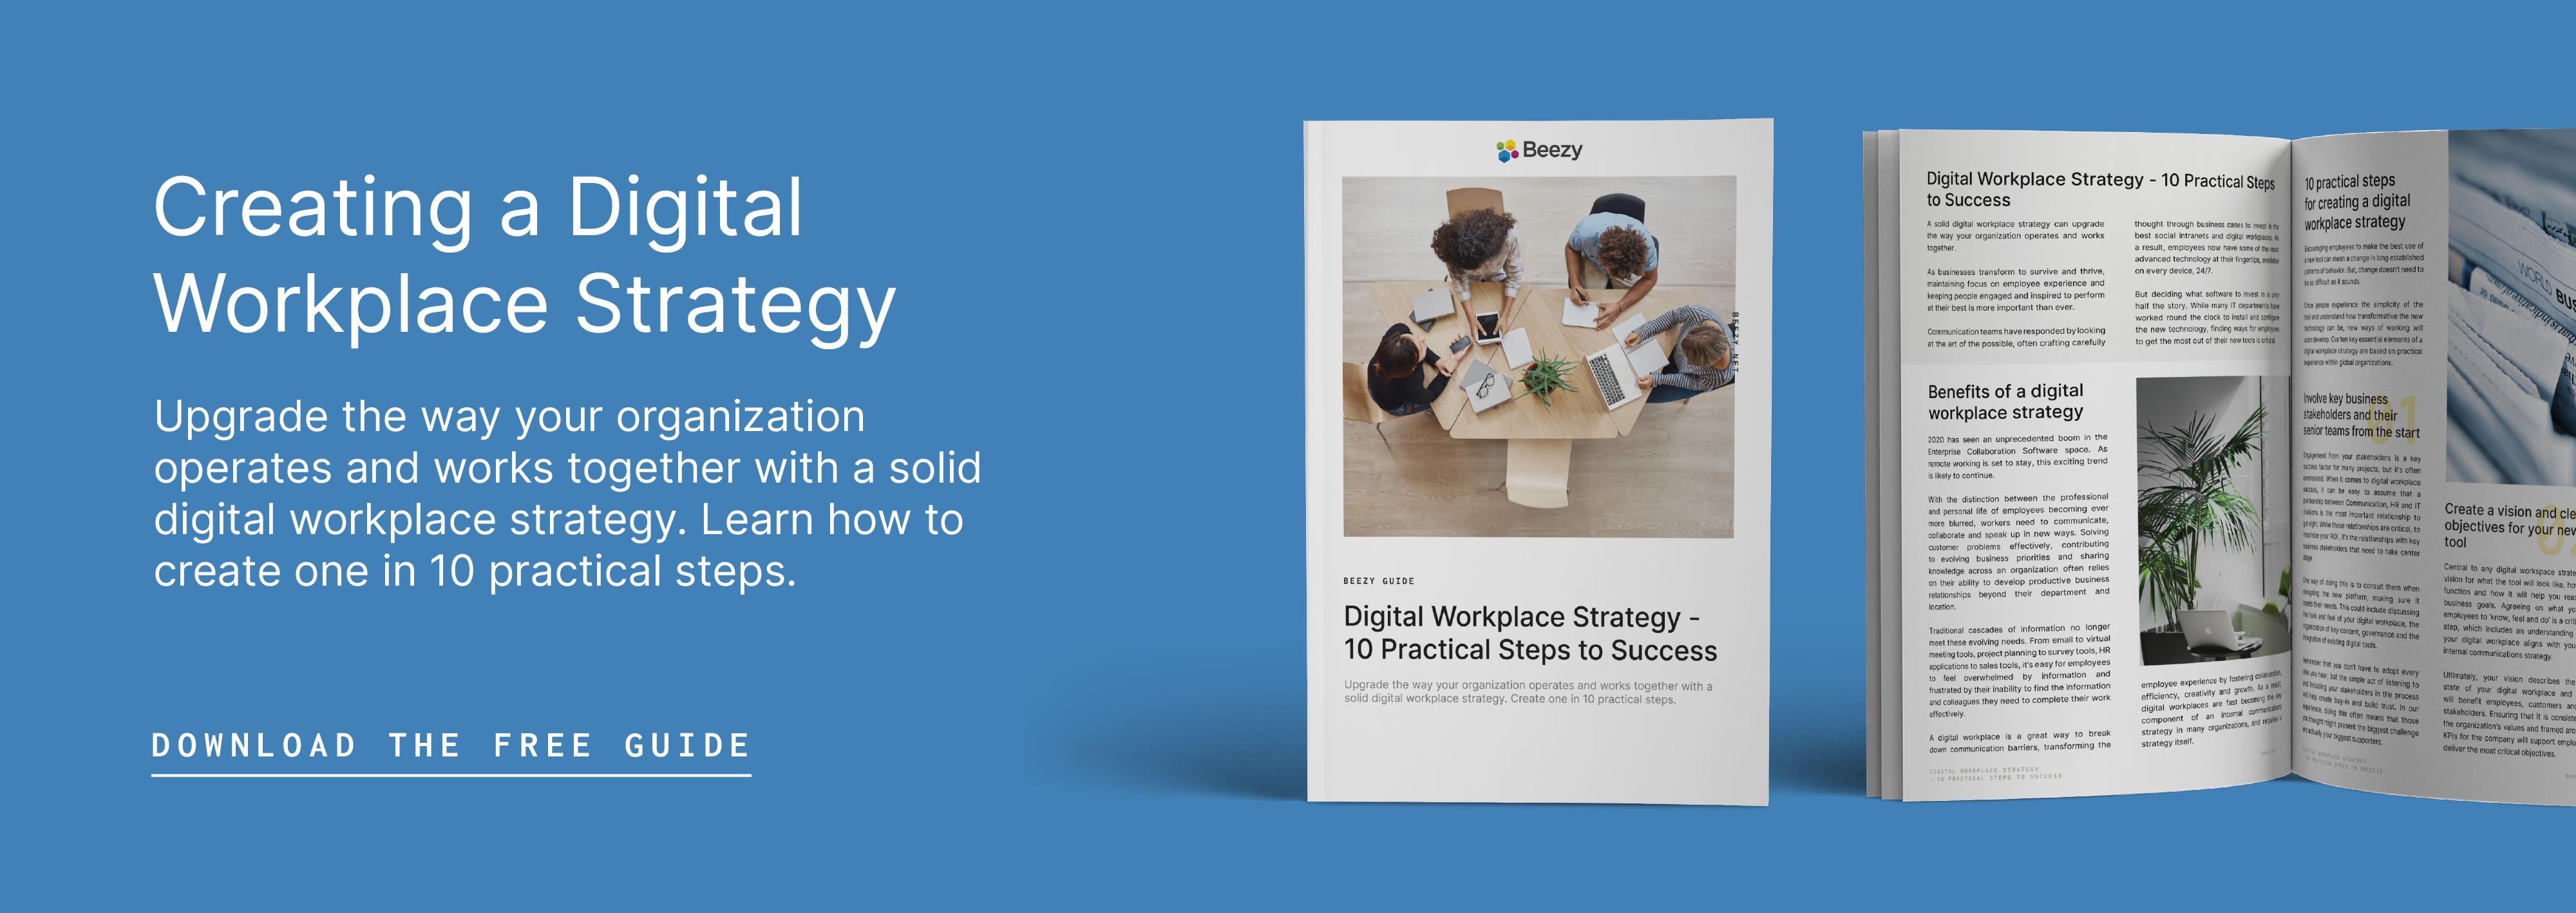 Digital Workplace Strategy CTA